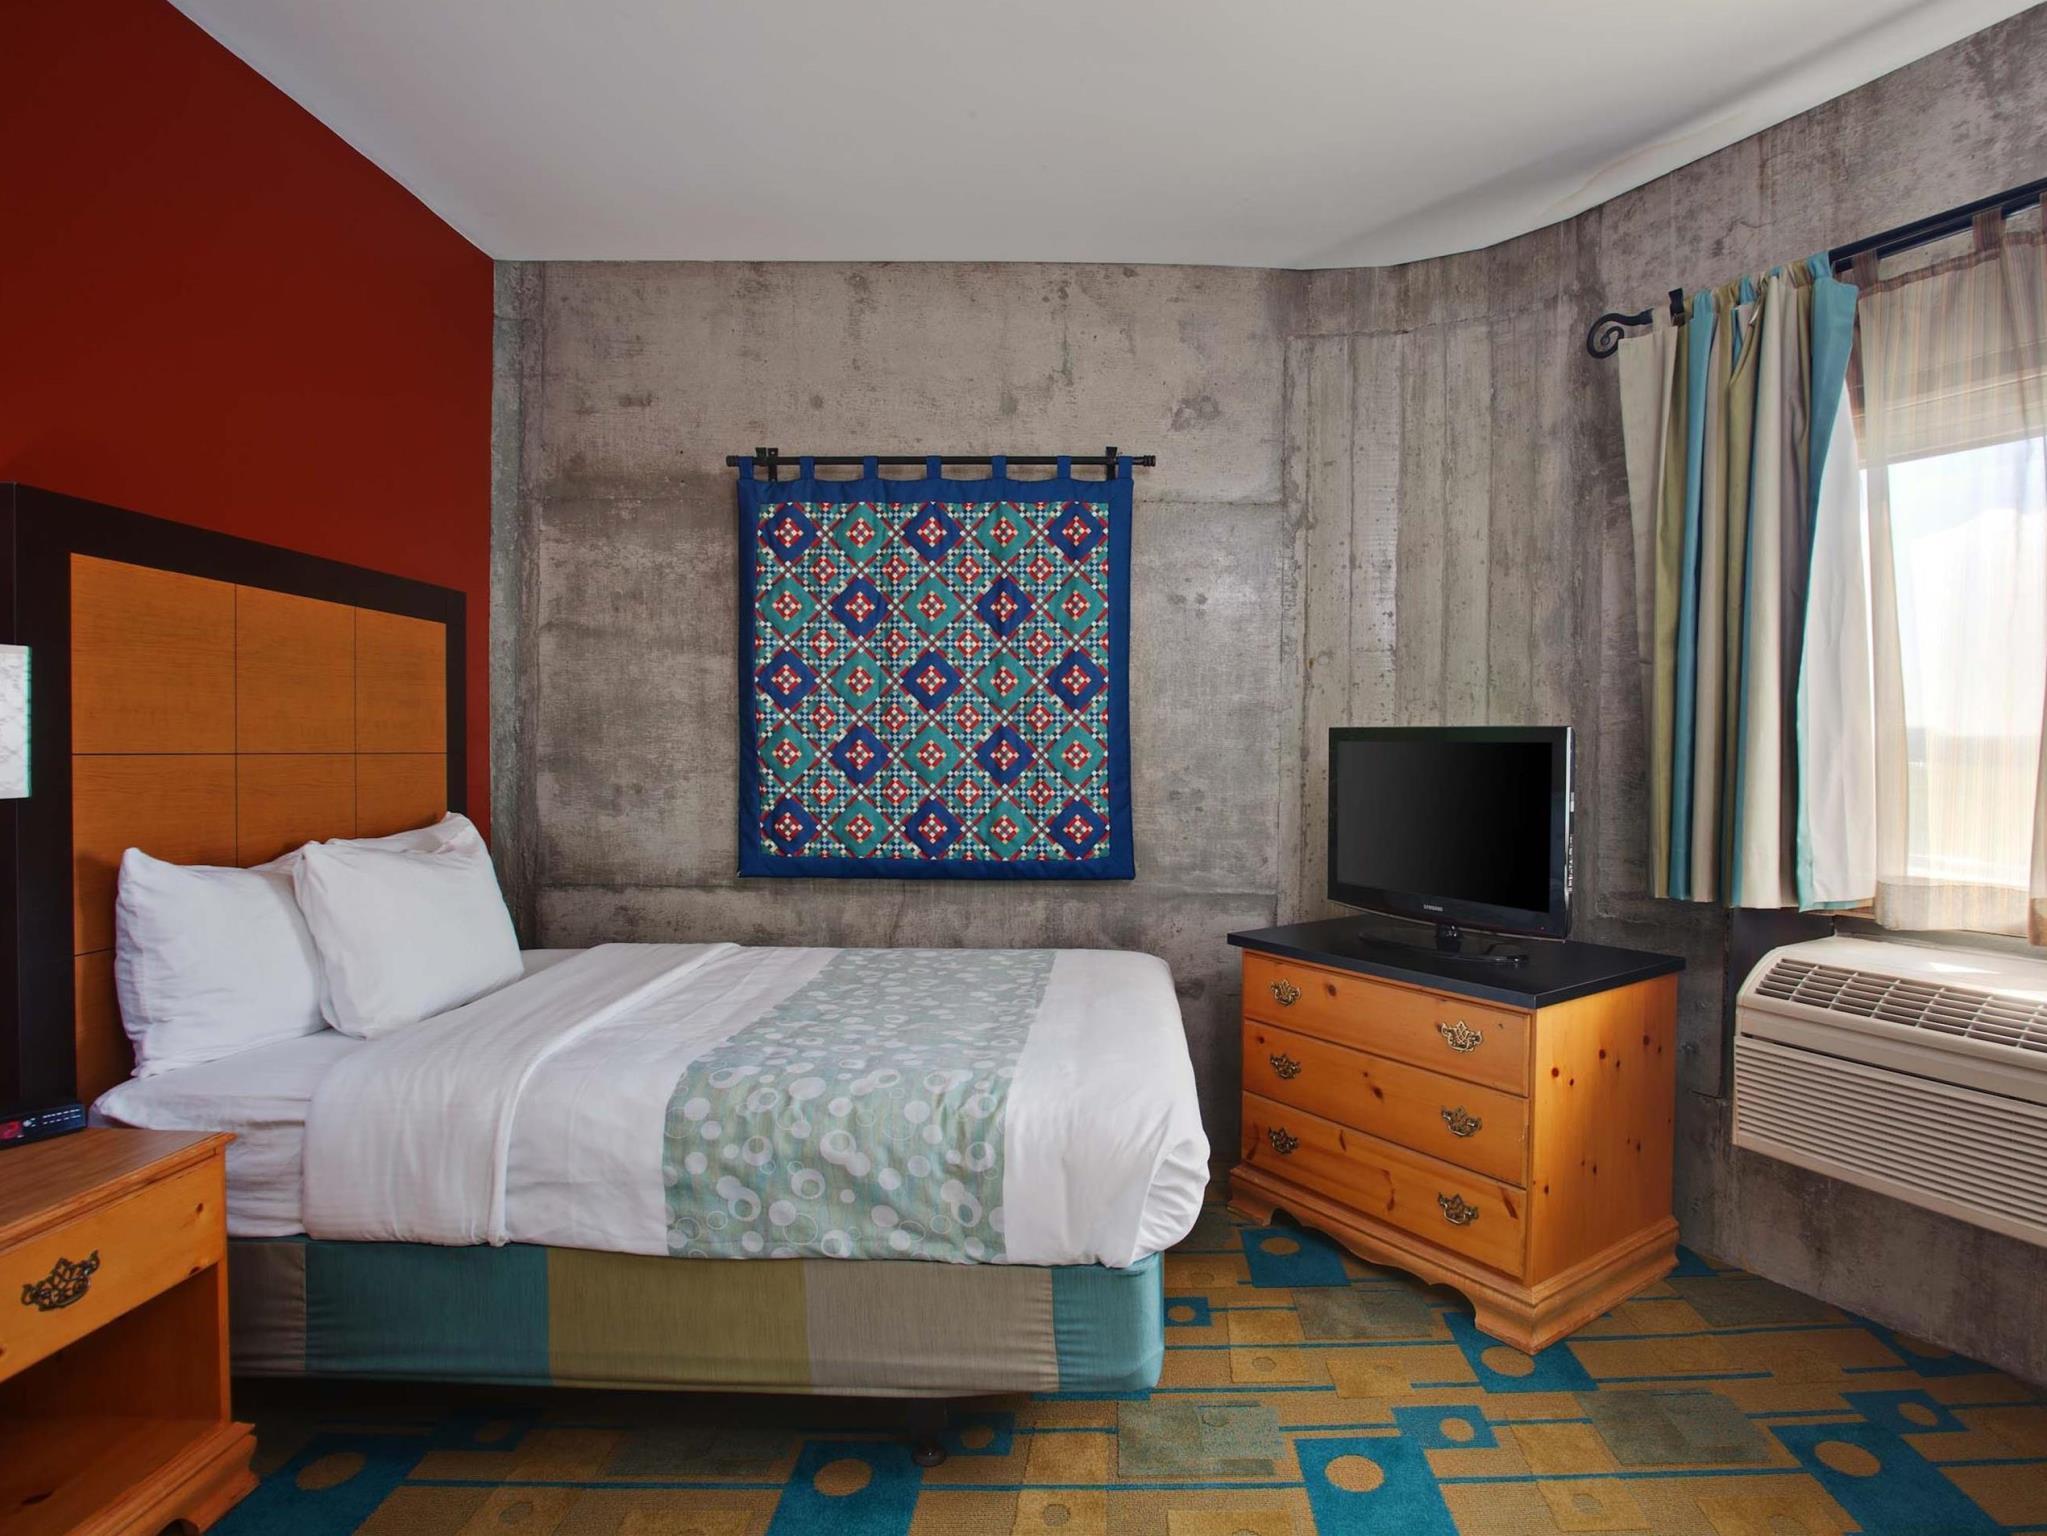 La Quinta Inn And Suites By Wyndham Irvine Spectrum